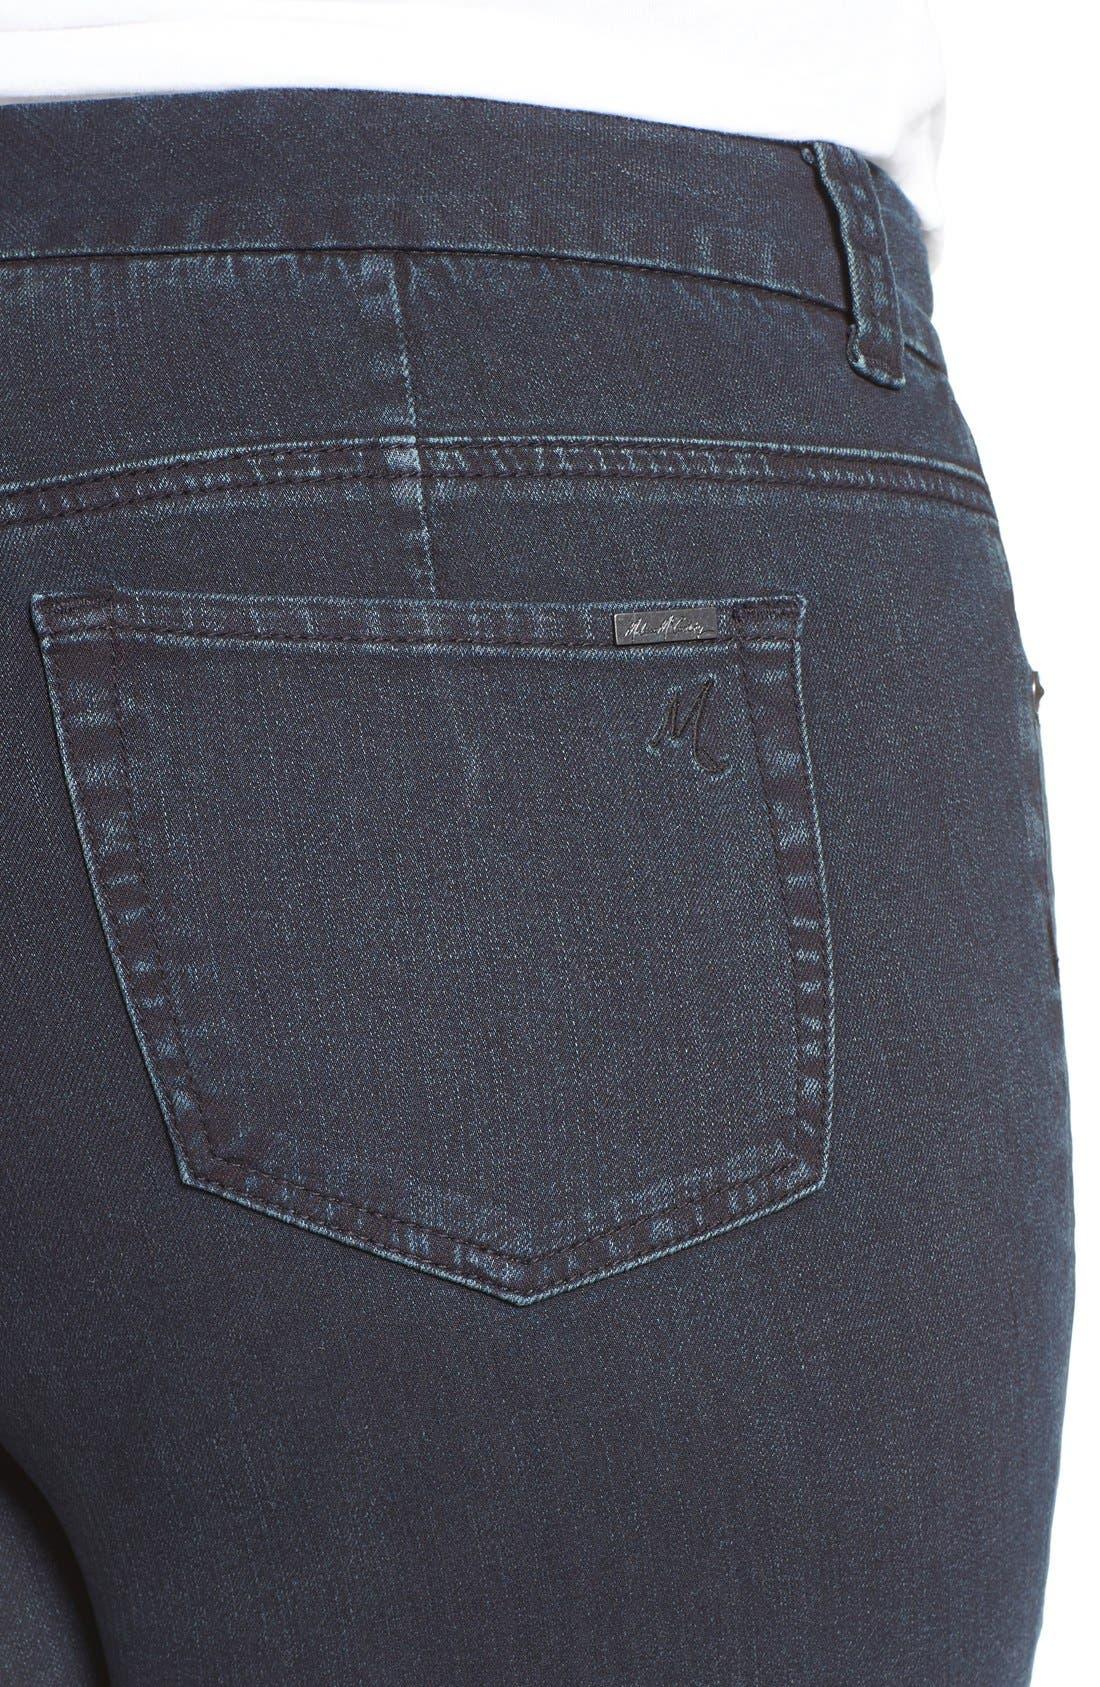 Pencil Leg Jeans,                             Alternate thumbnail 2, color,                             418